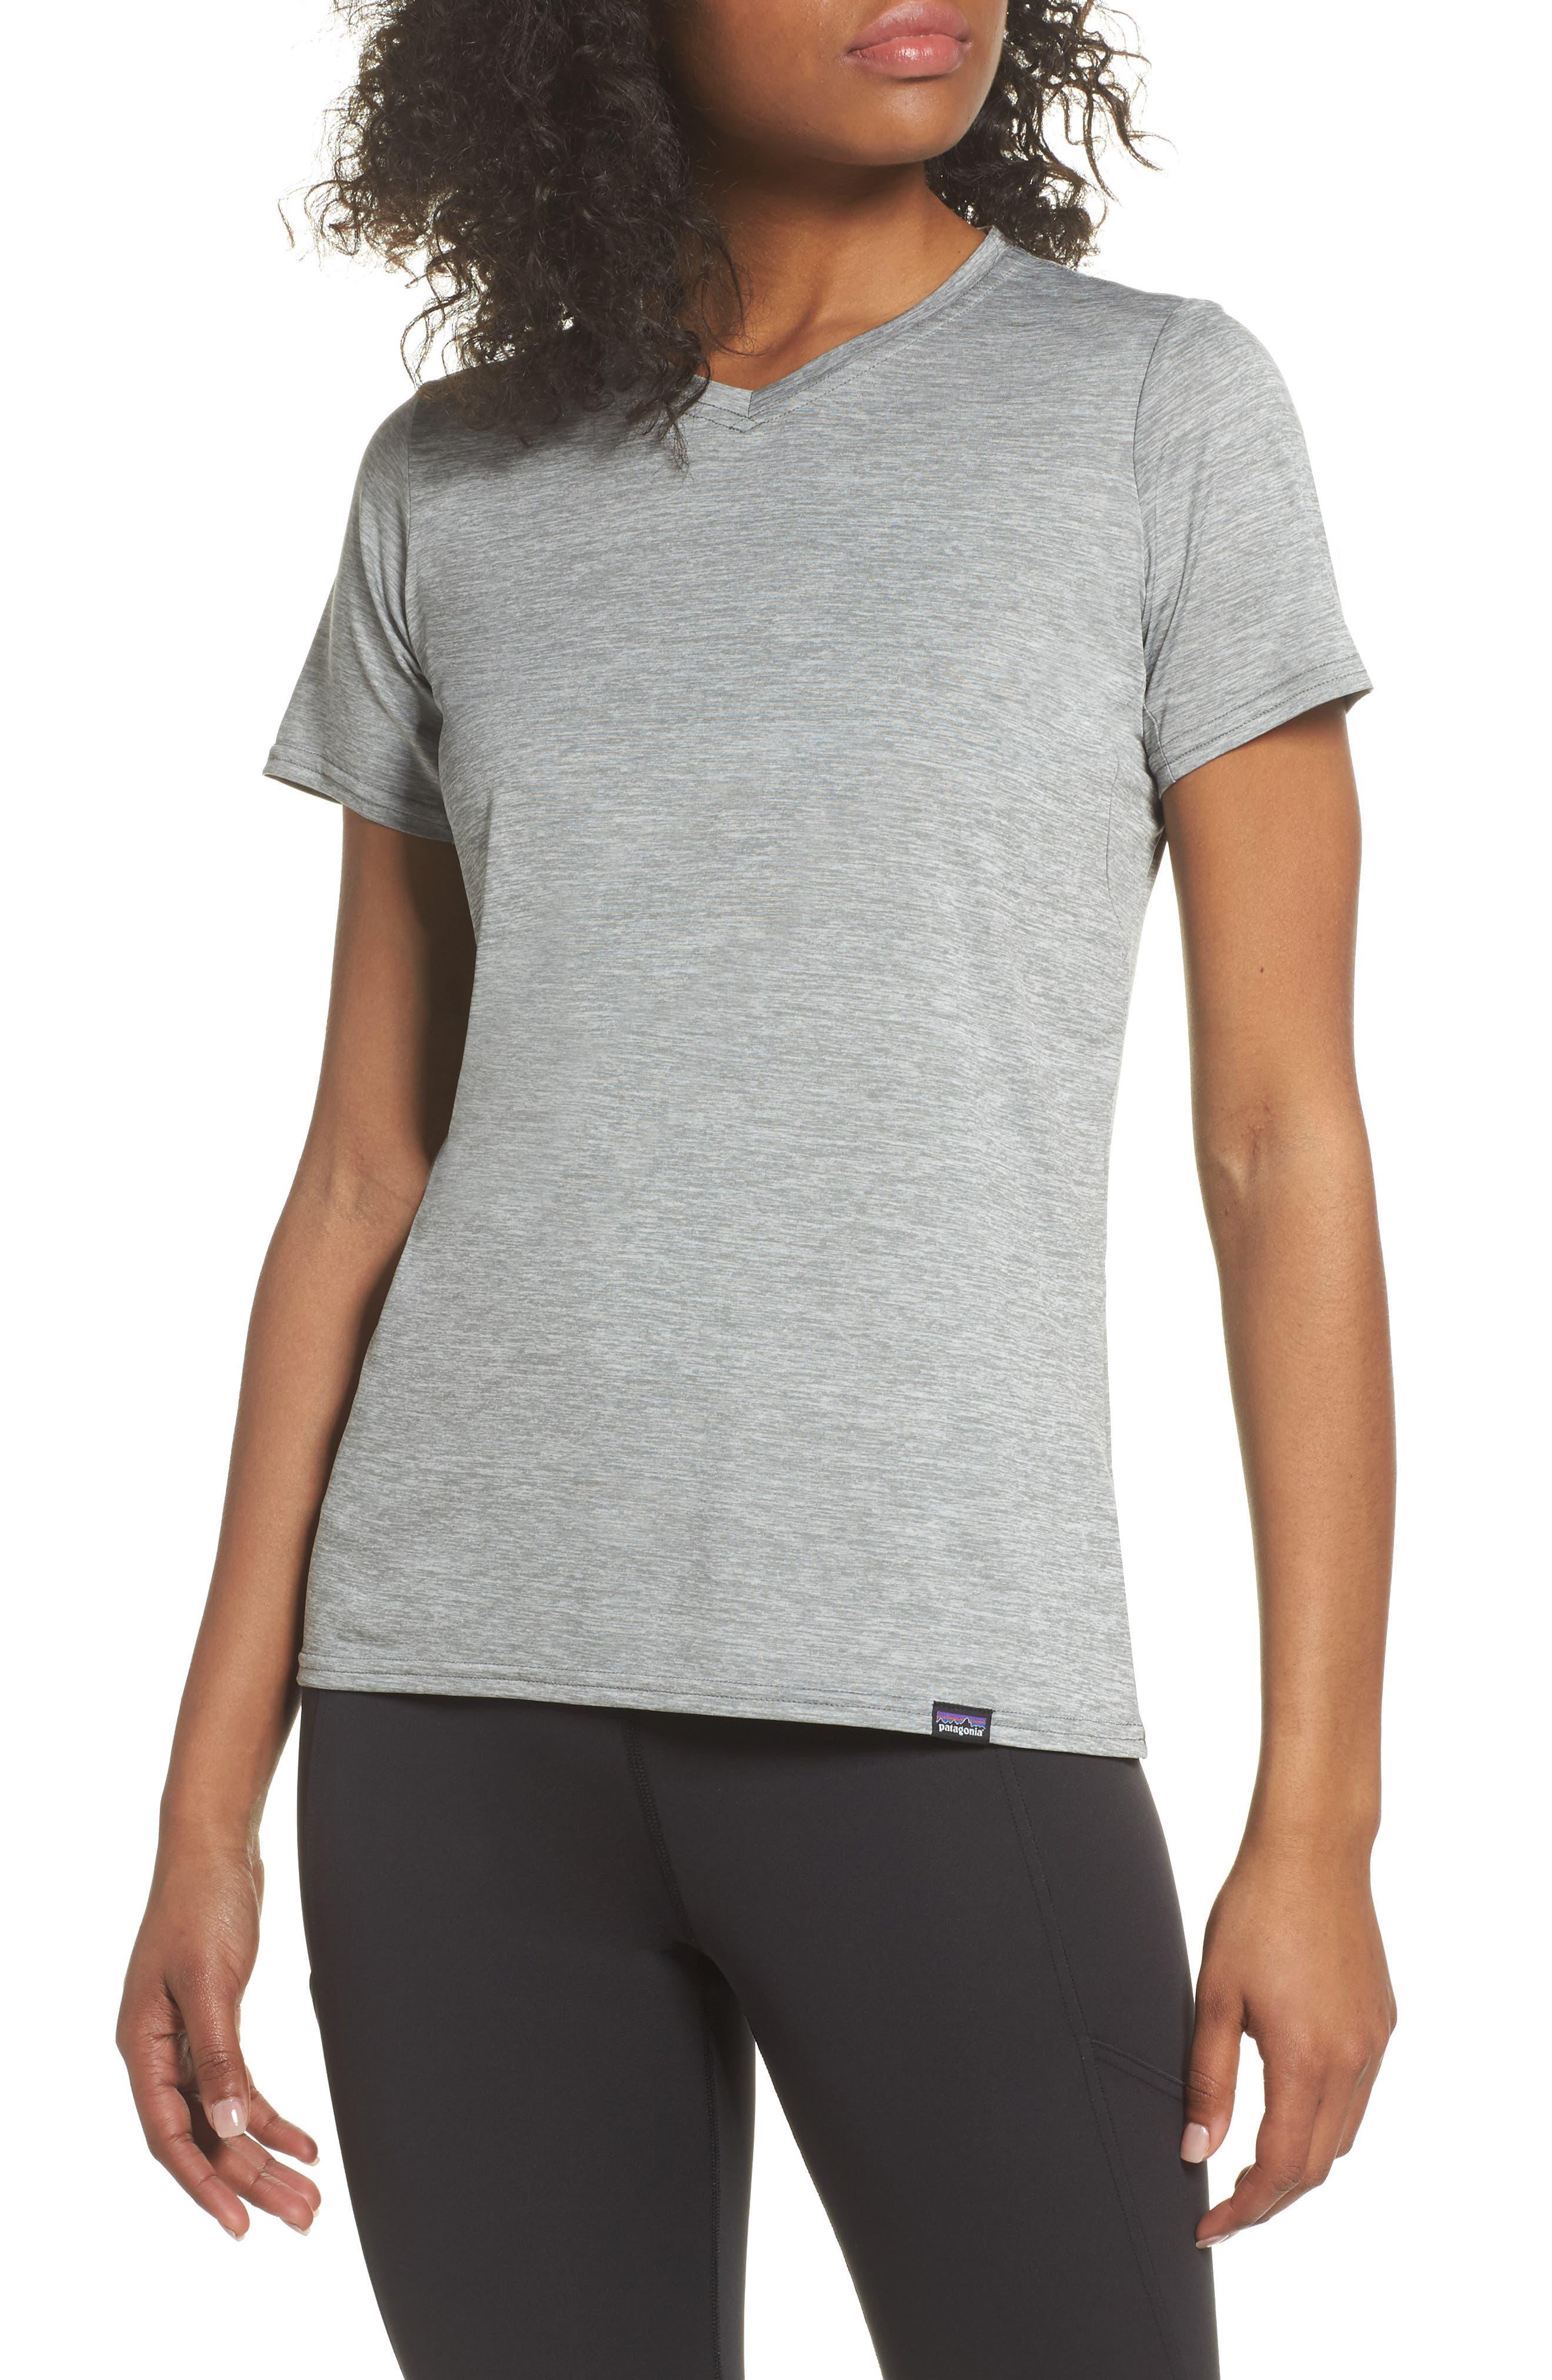 Capilene<sup>®</sup> Dailty T-Shirt,                             Main thumbnail 1, color,                             Feather Grey